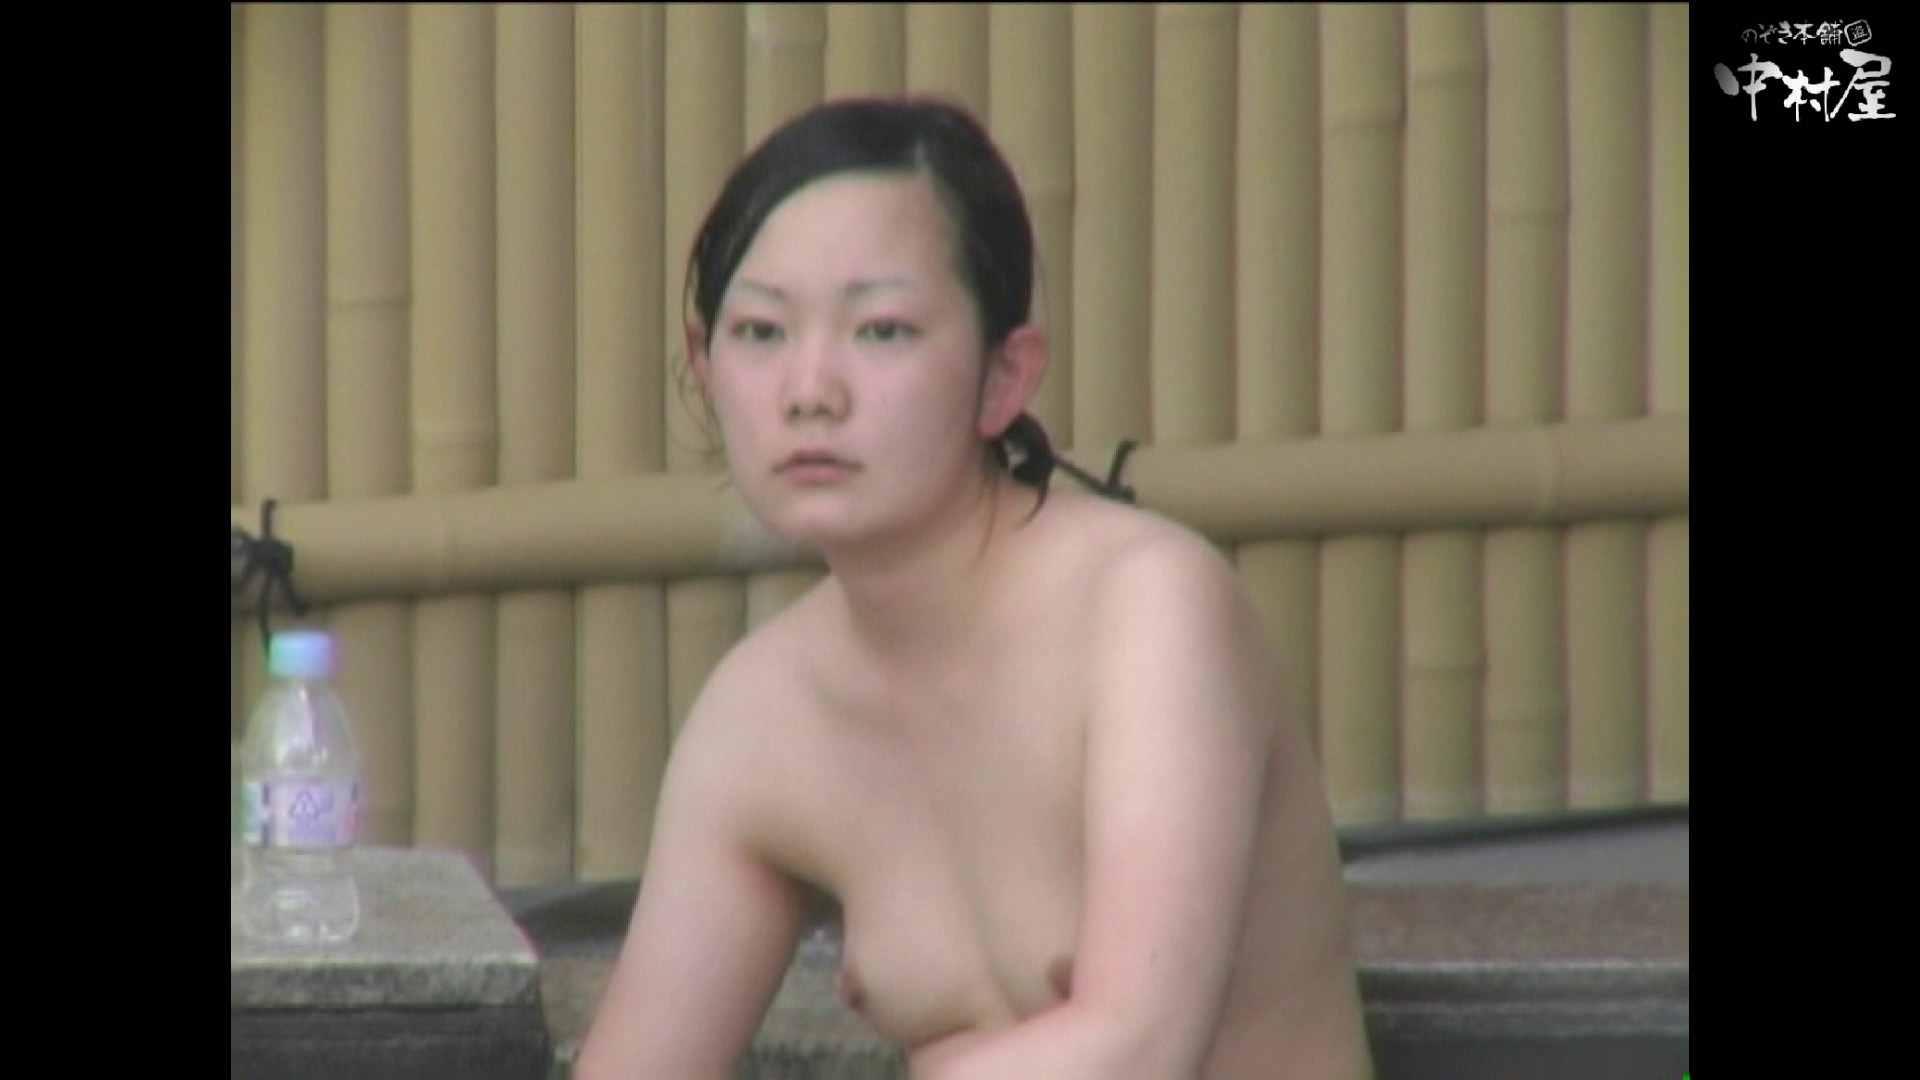 Aquaな露天風呂Vol.892 盗撮 われめAV動画紹介 80画像 5